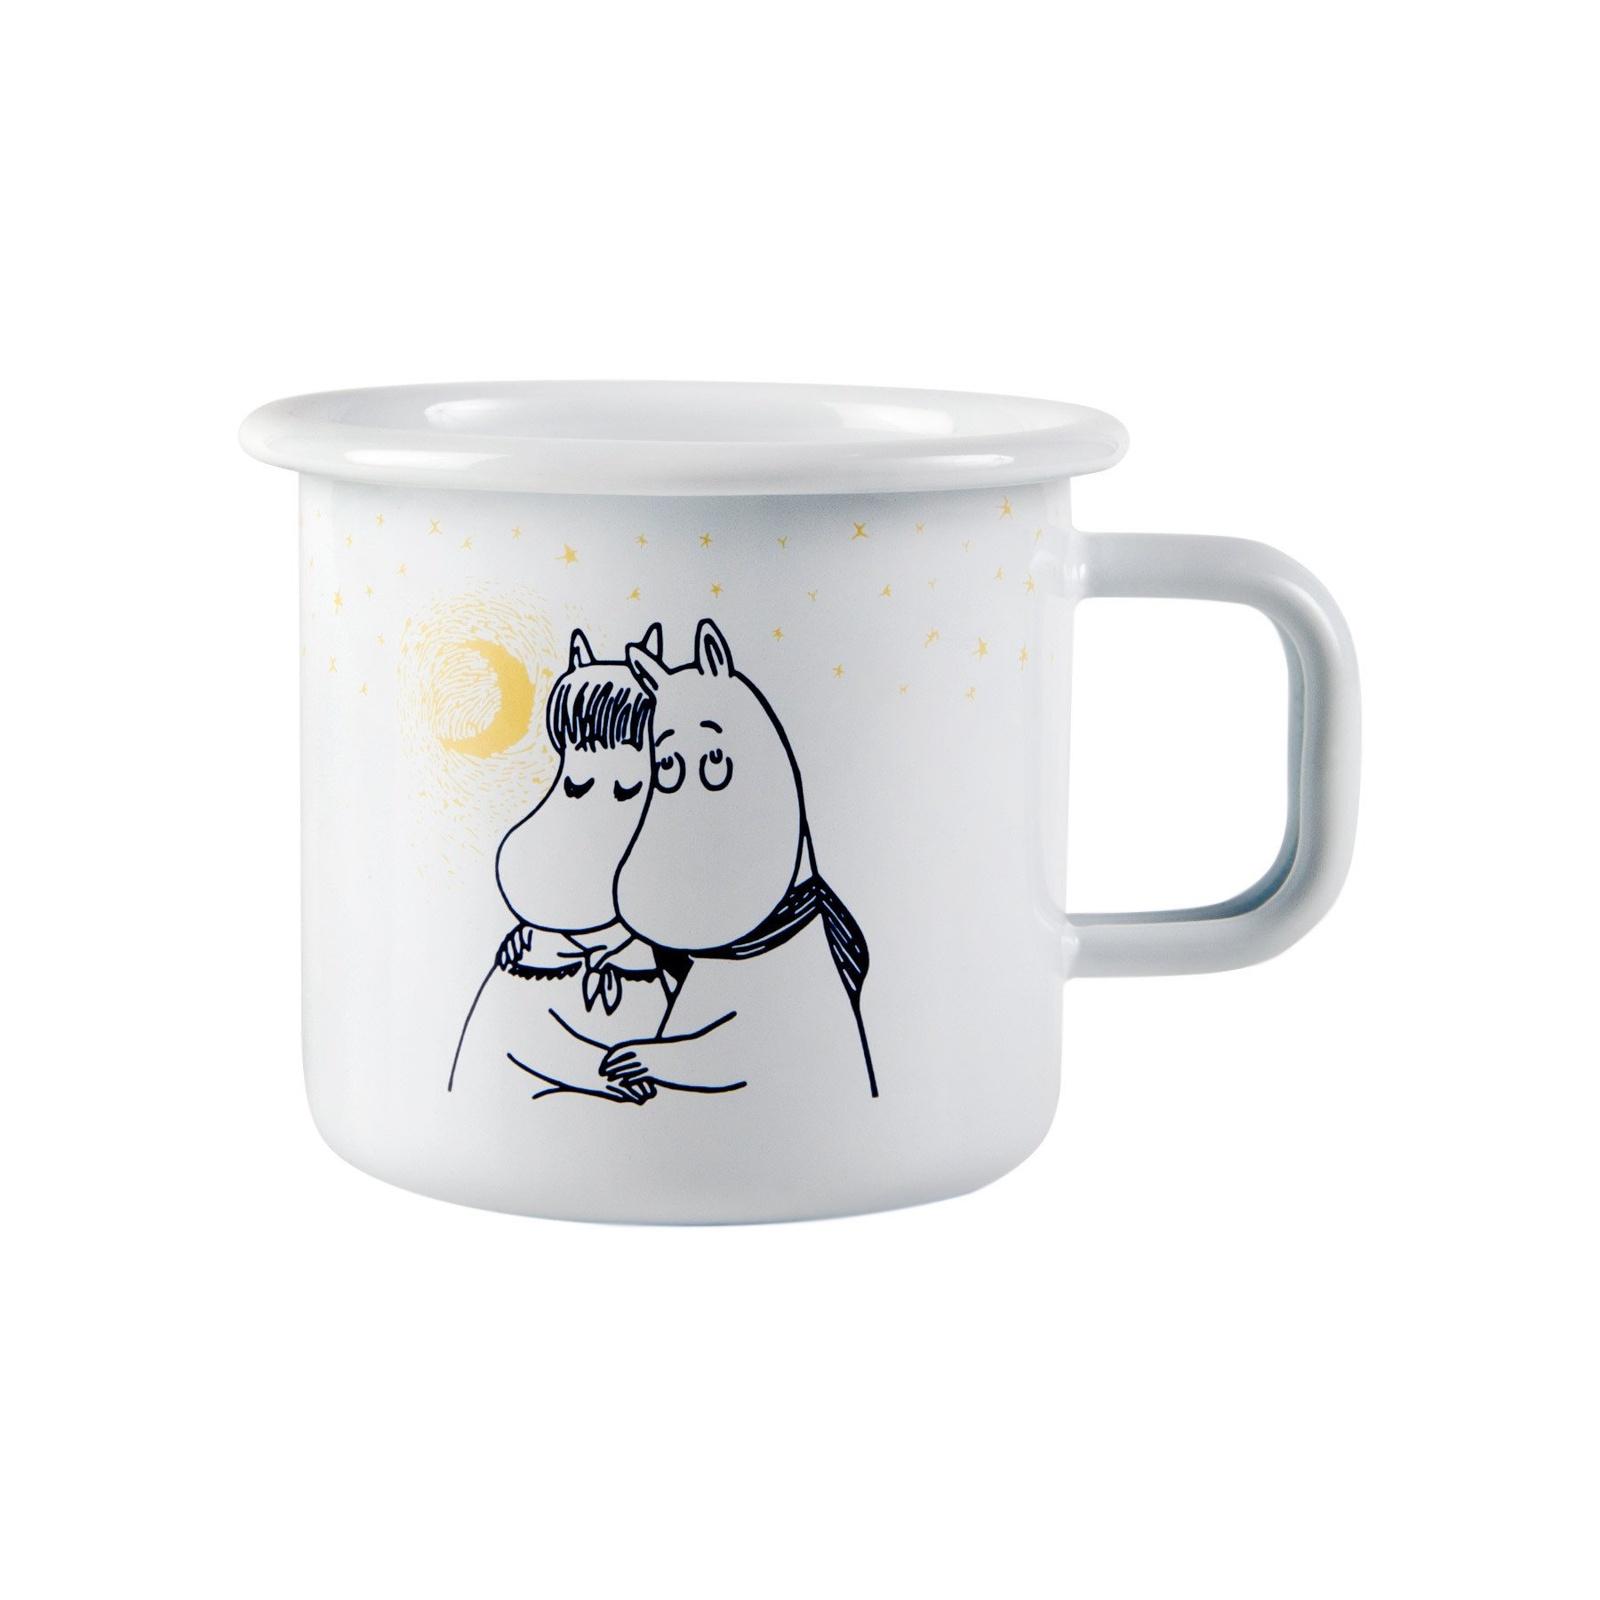 Moomin Кружка эмалированная Зимняя романтика, 370 мл white